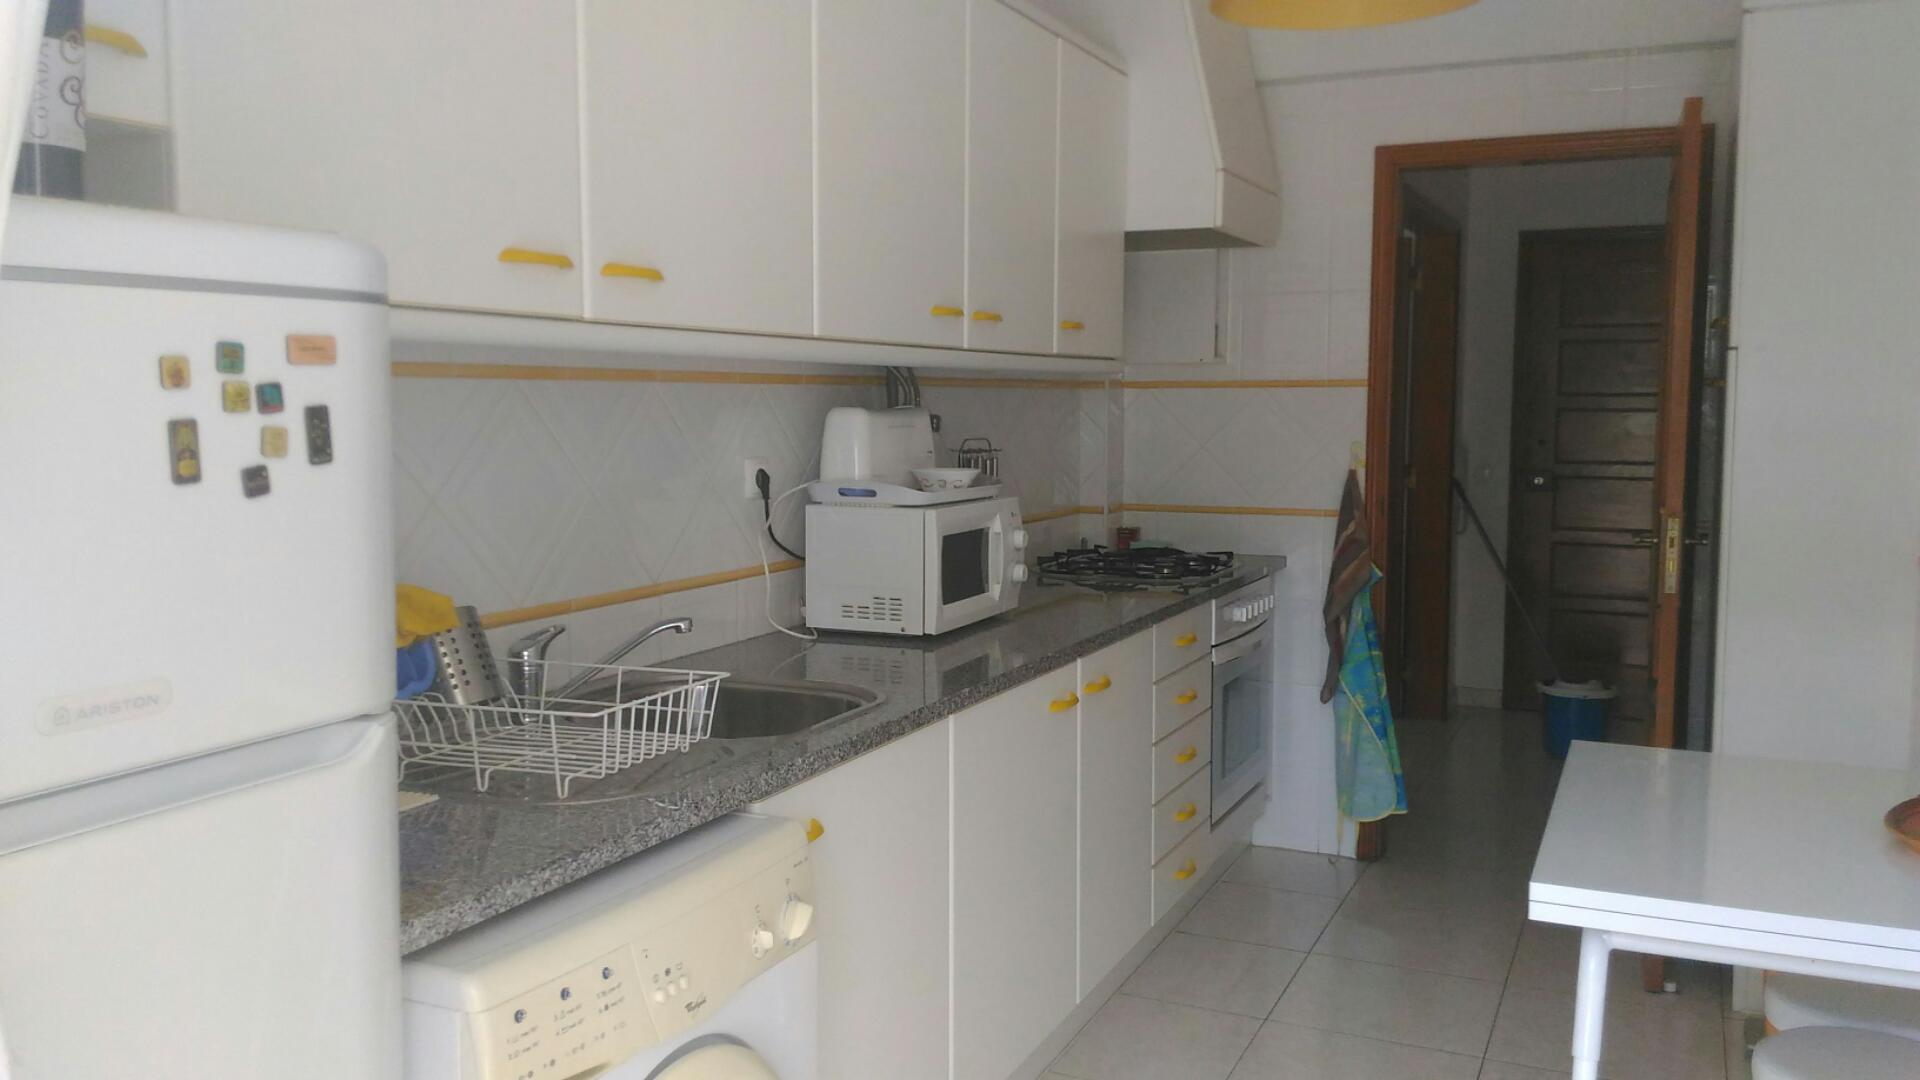 Holiday apartments and villas for rent, T1 Moredo in Armação de Pêra, Portugal Algarve, REF_IMG_8899_8908